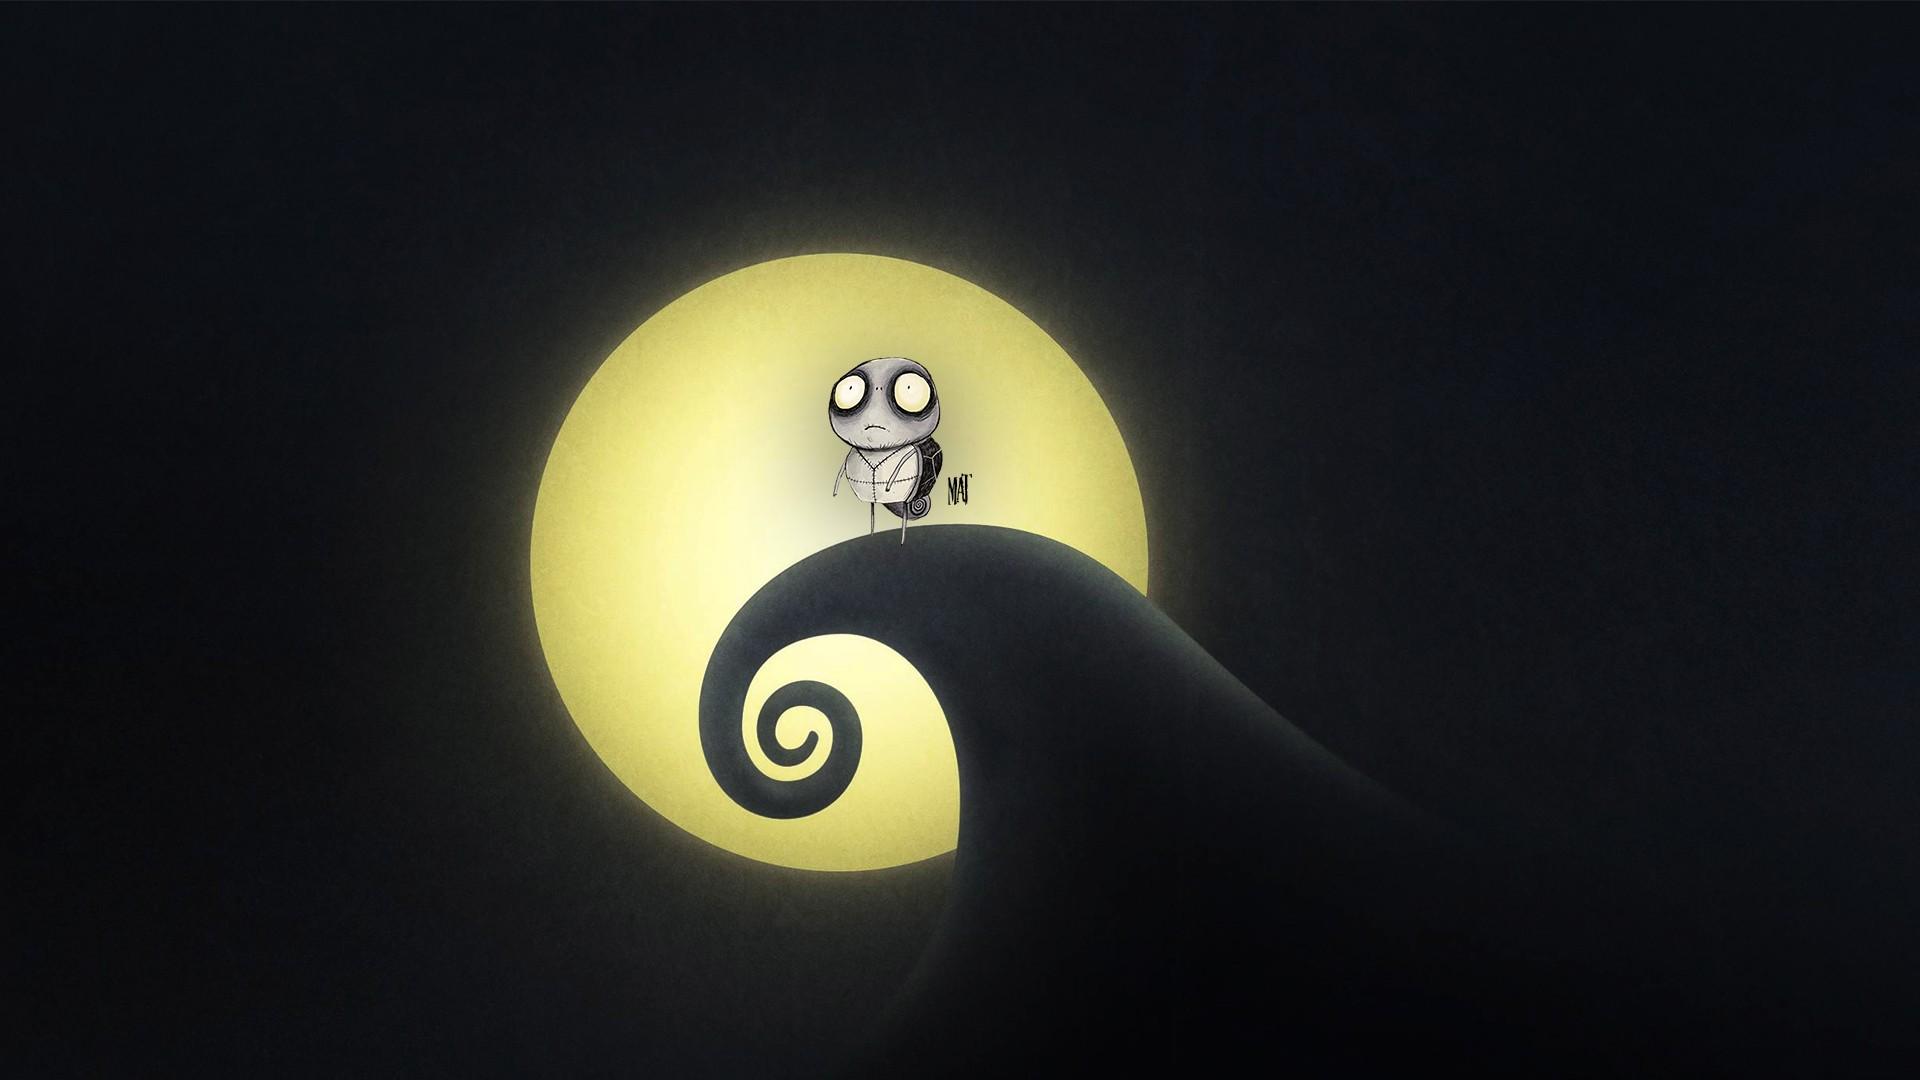 Mobile Wallpaper Cute Baby Tim Burton Nightmare Shadow Lights Wallpaper Anime